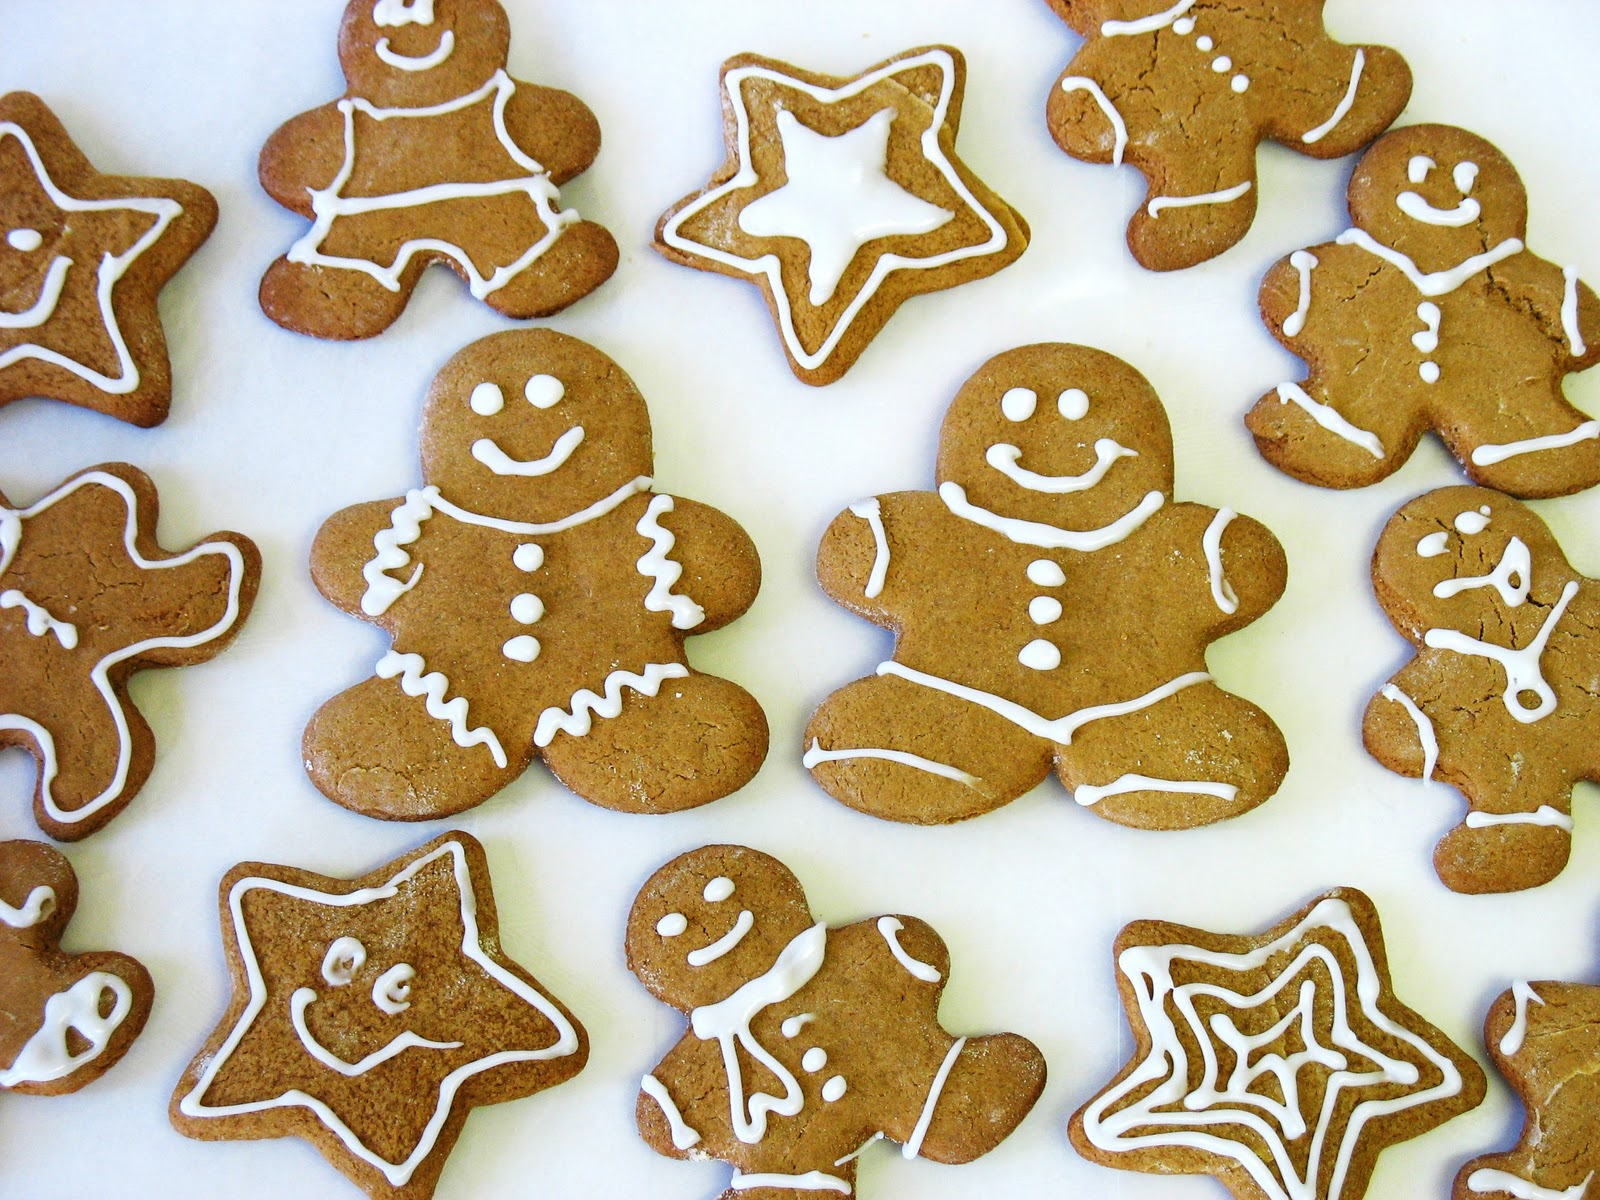 The Gluten Free Spouse: Gluten Free Gingerbread Cookies